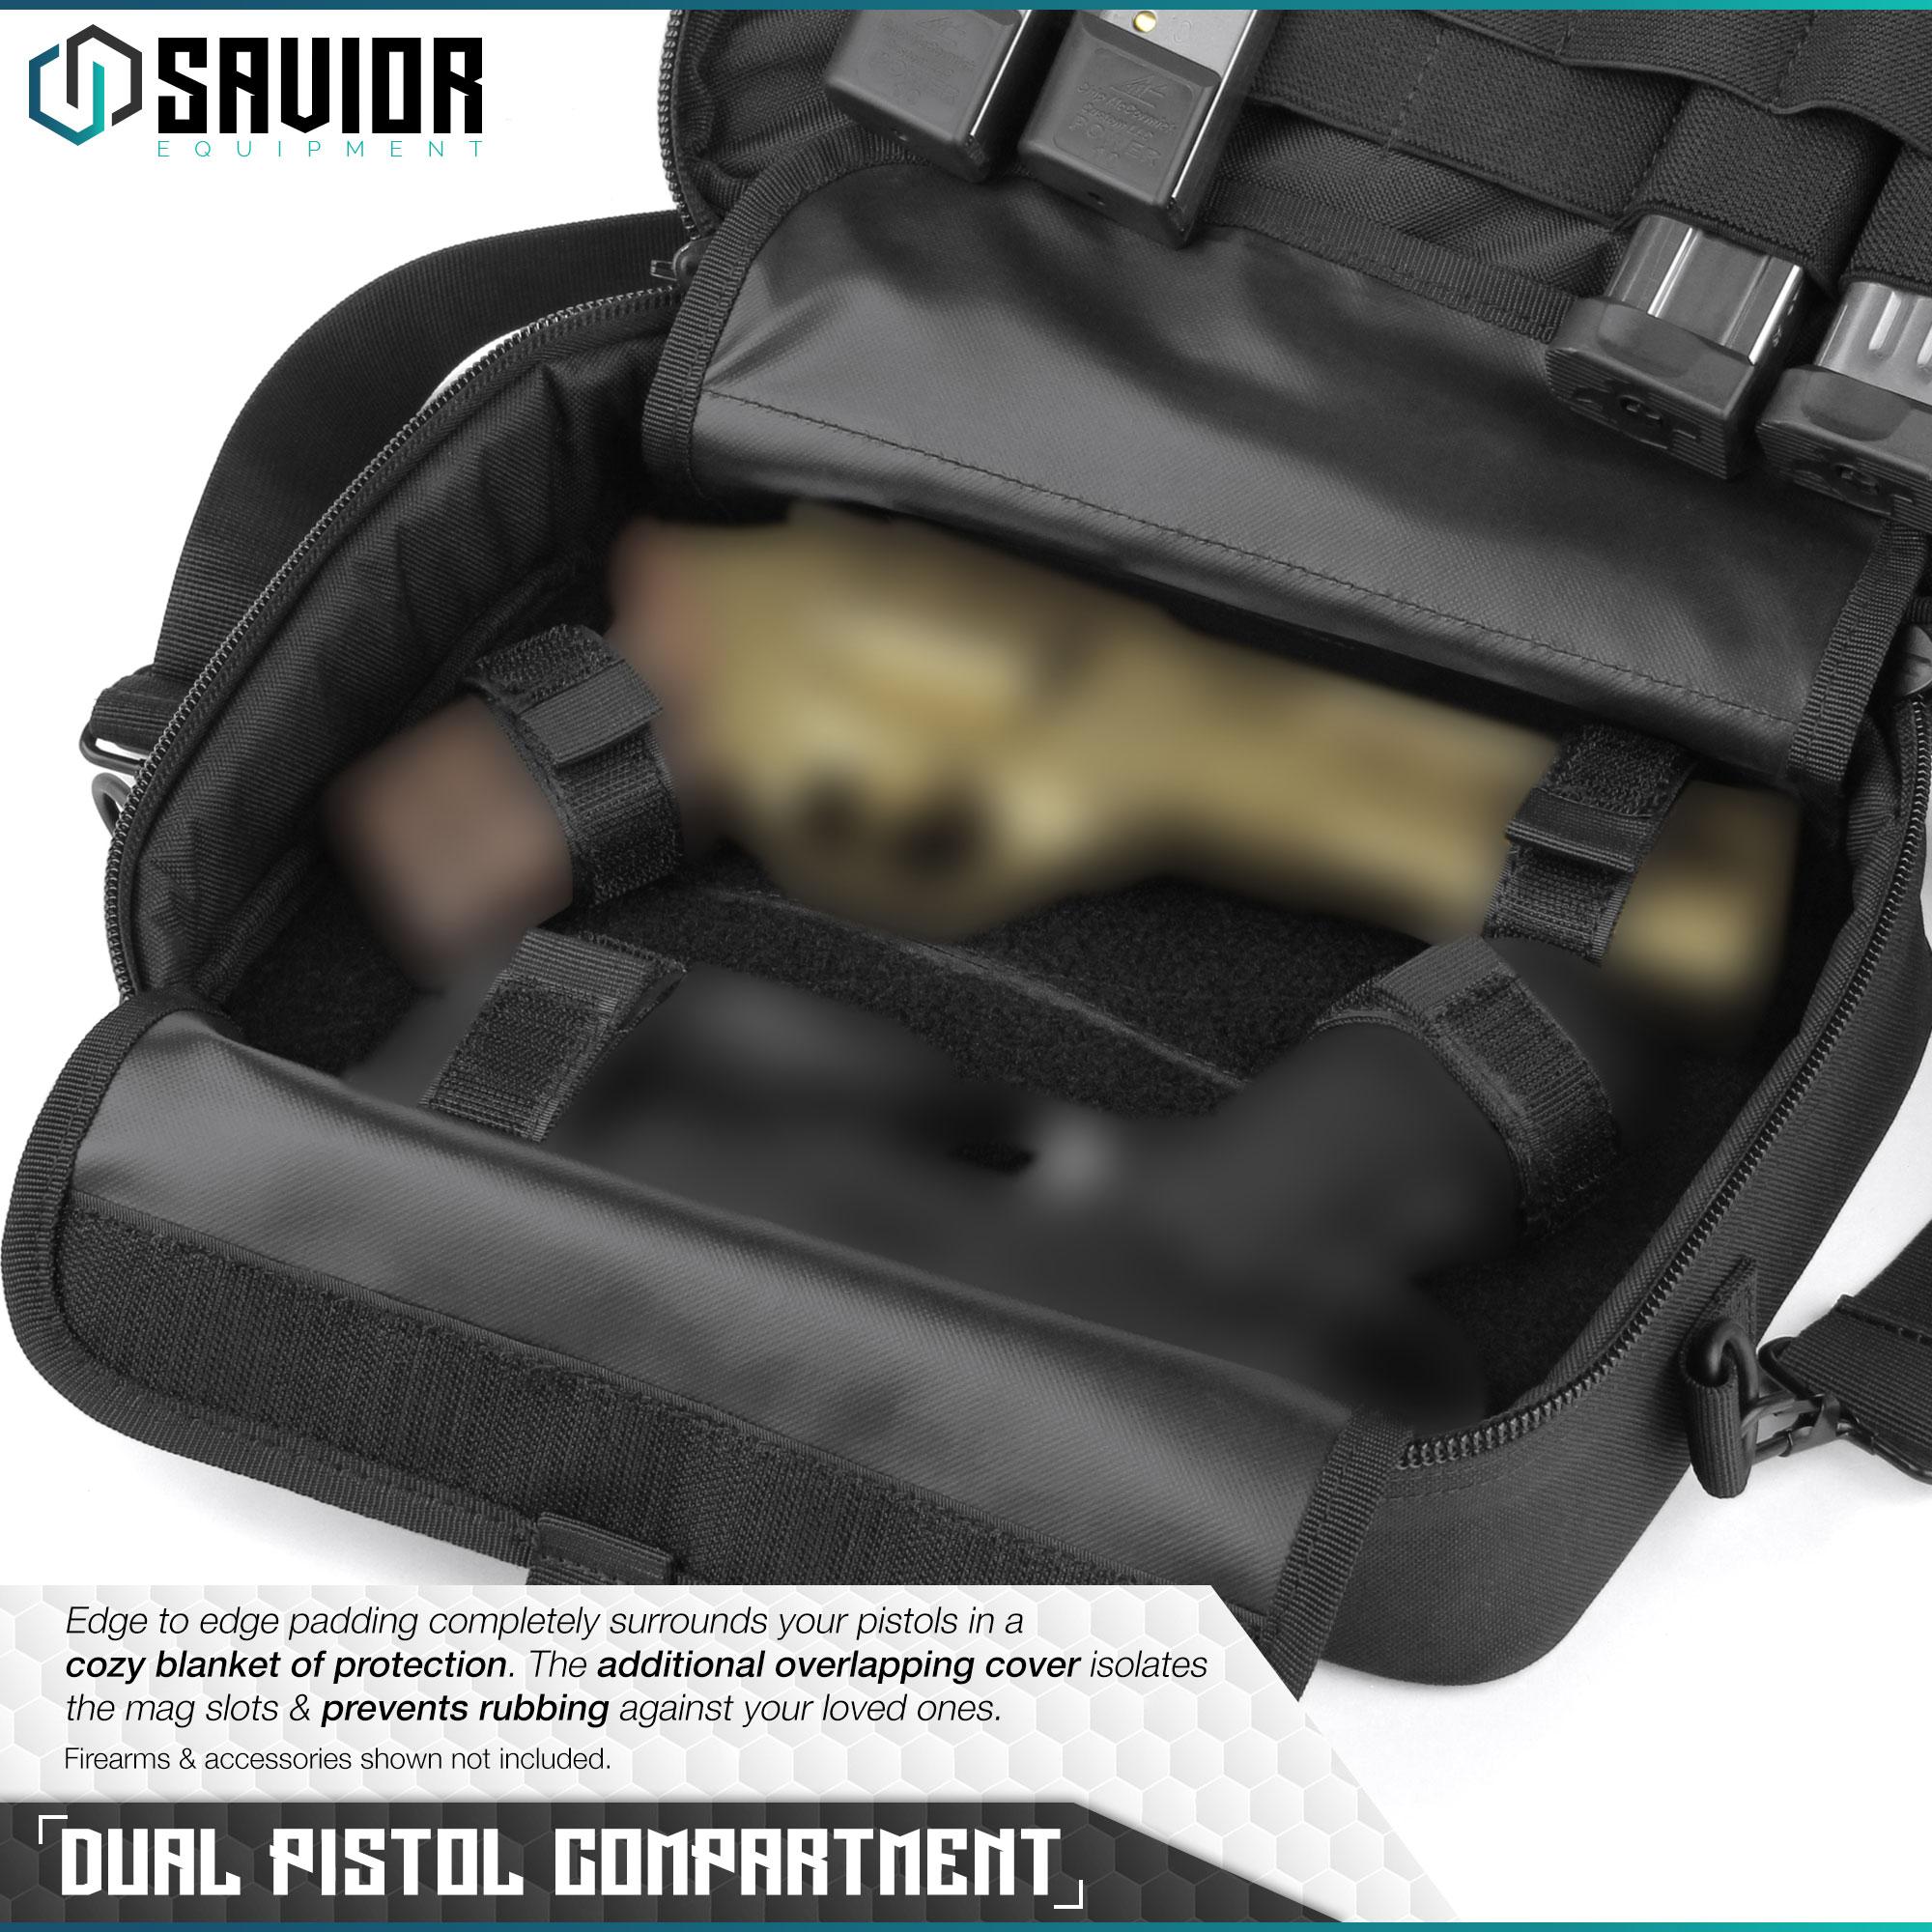 thumbnail 15 - 034-SAVIOR-034-Padded-Discreet-Double-Handgun-Bag-Pistol-Storage-Case-w-Mag-Pouch-Slot